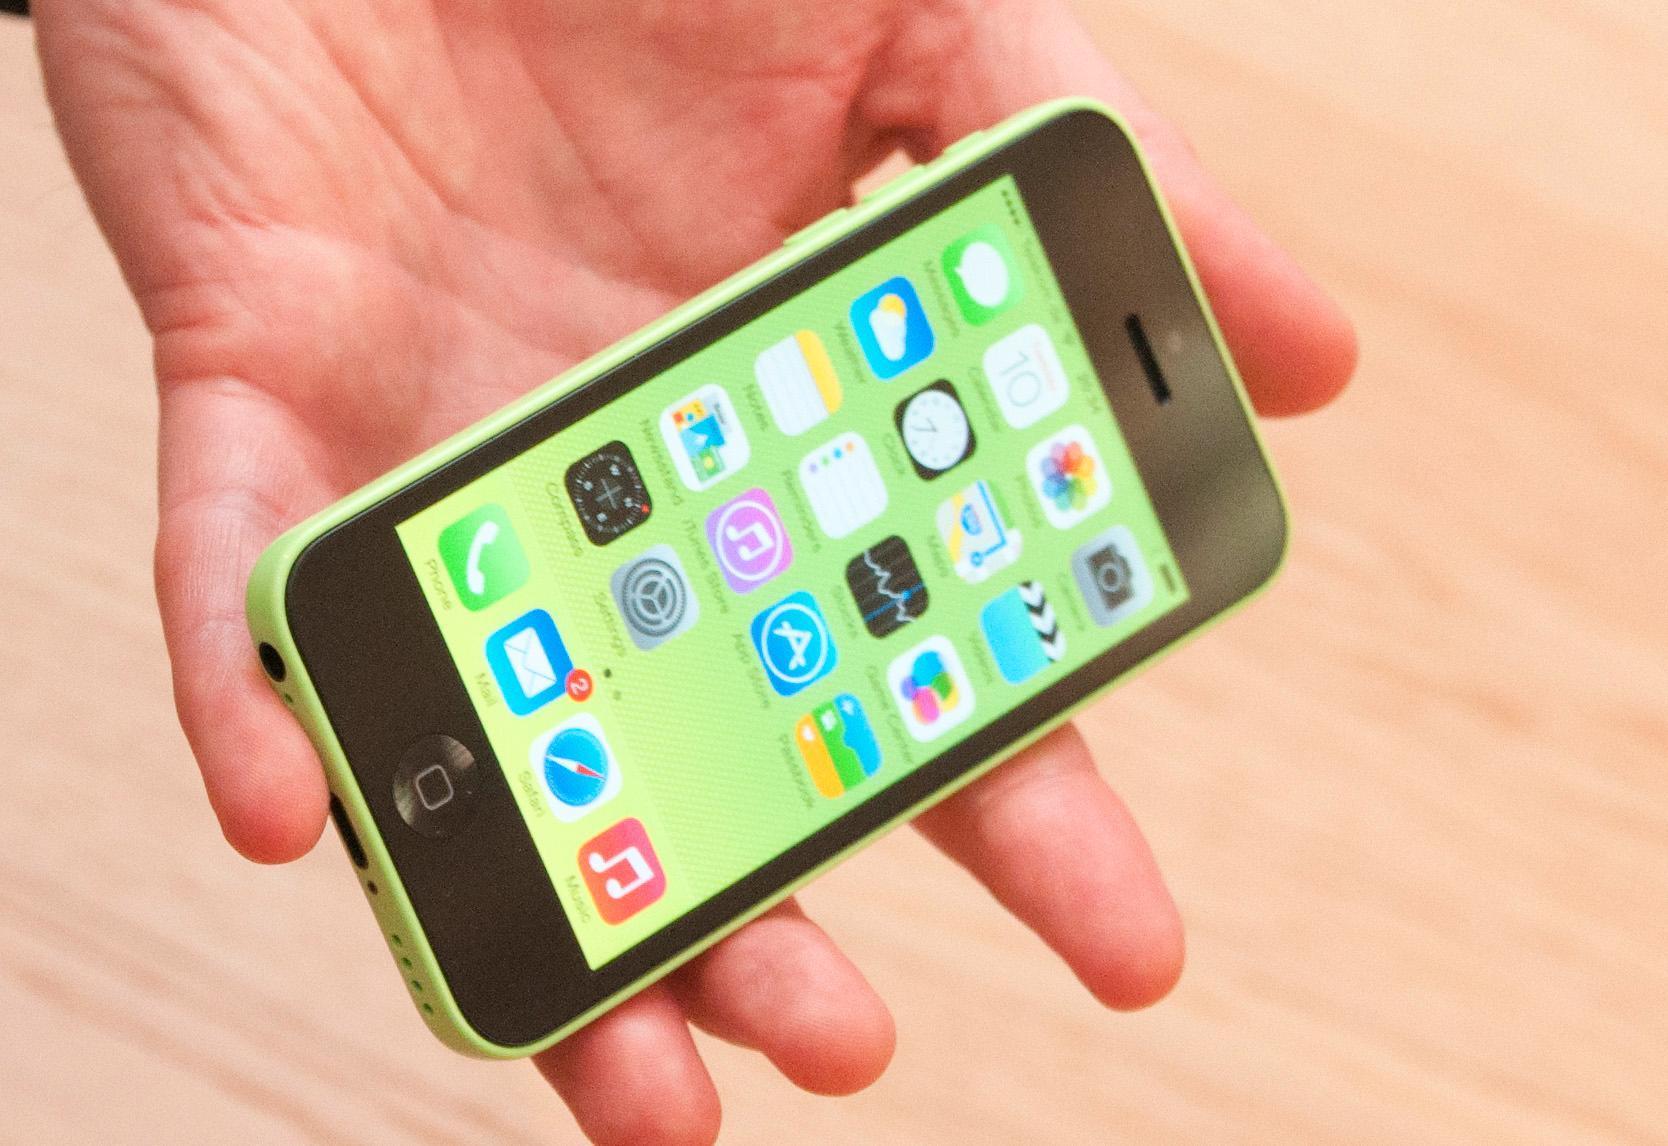 iPhone 5C kommer i en rekke farger, og du kan sette på en haug ulike deksler.Foto: Finn Jarle Kvalheim, Amobil.no